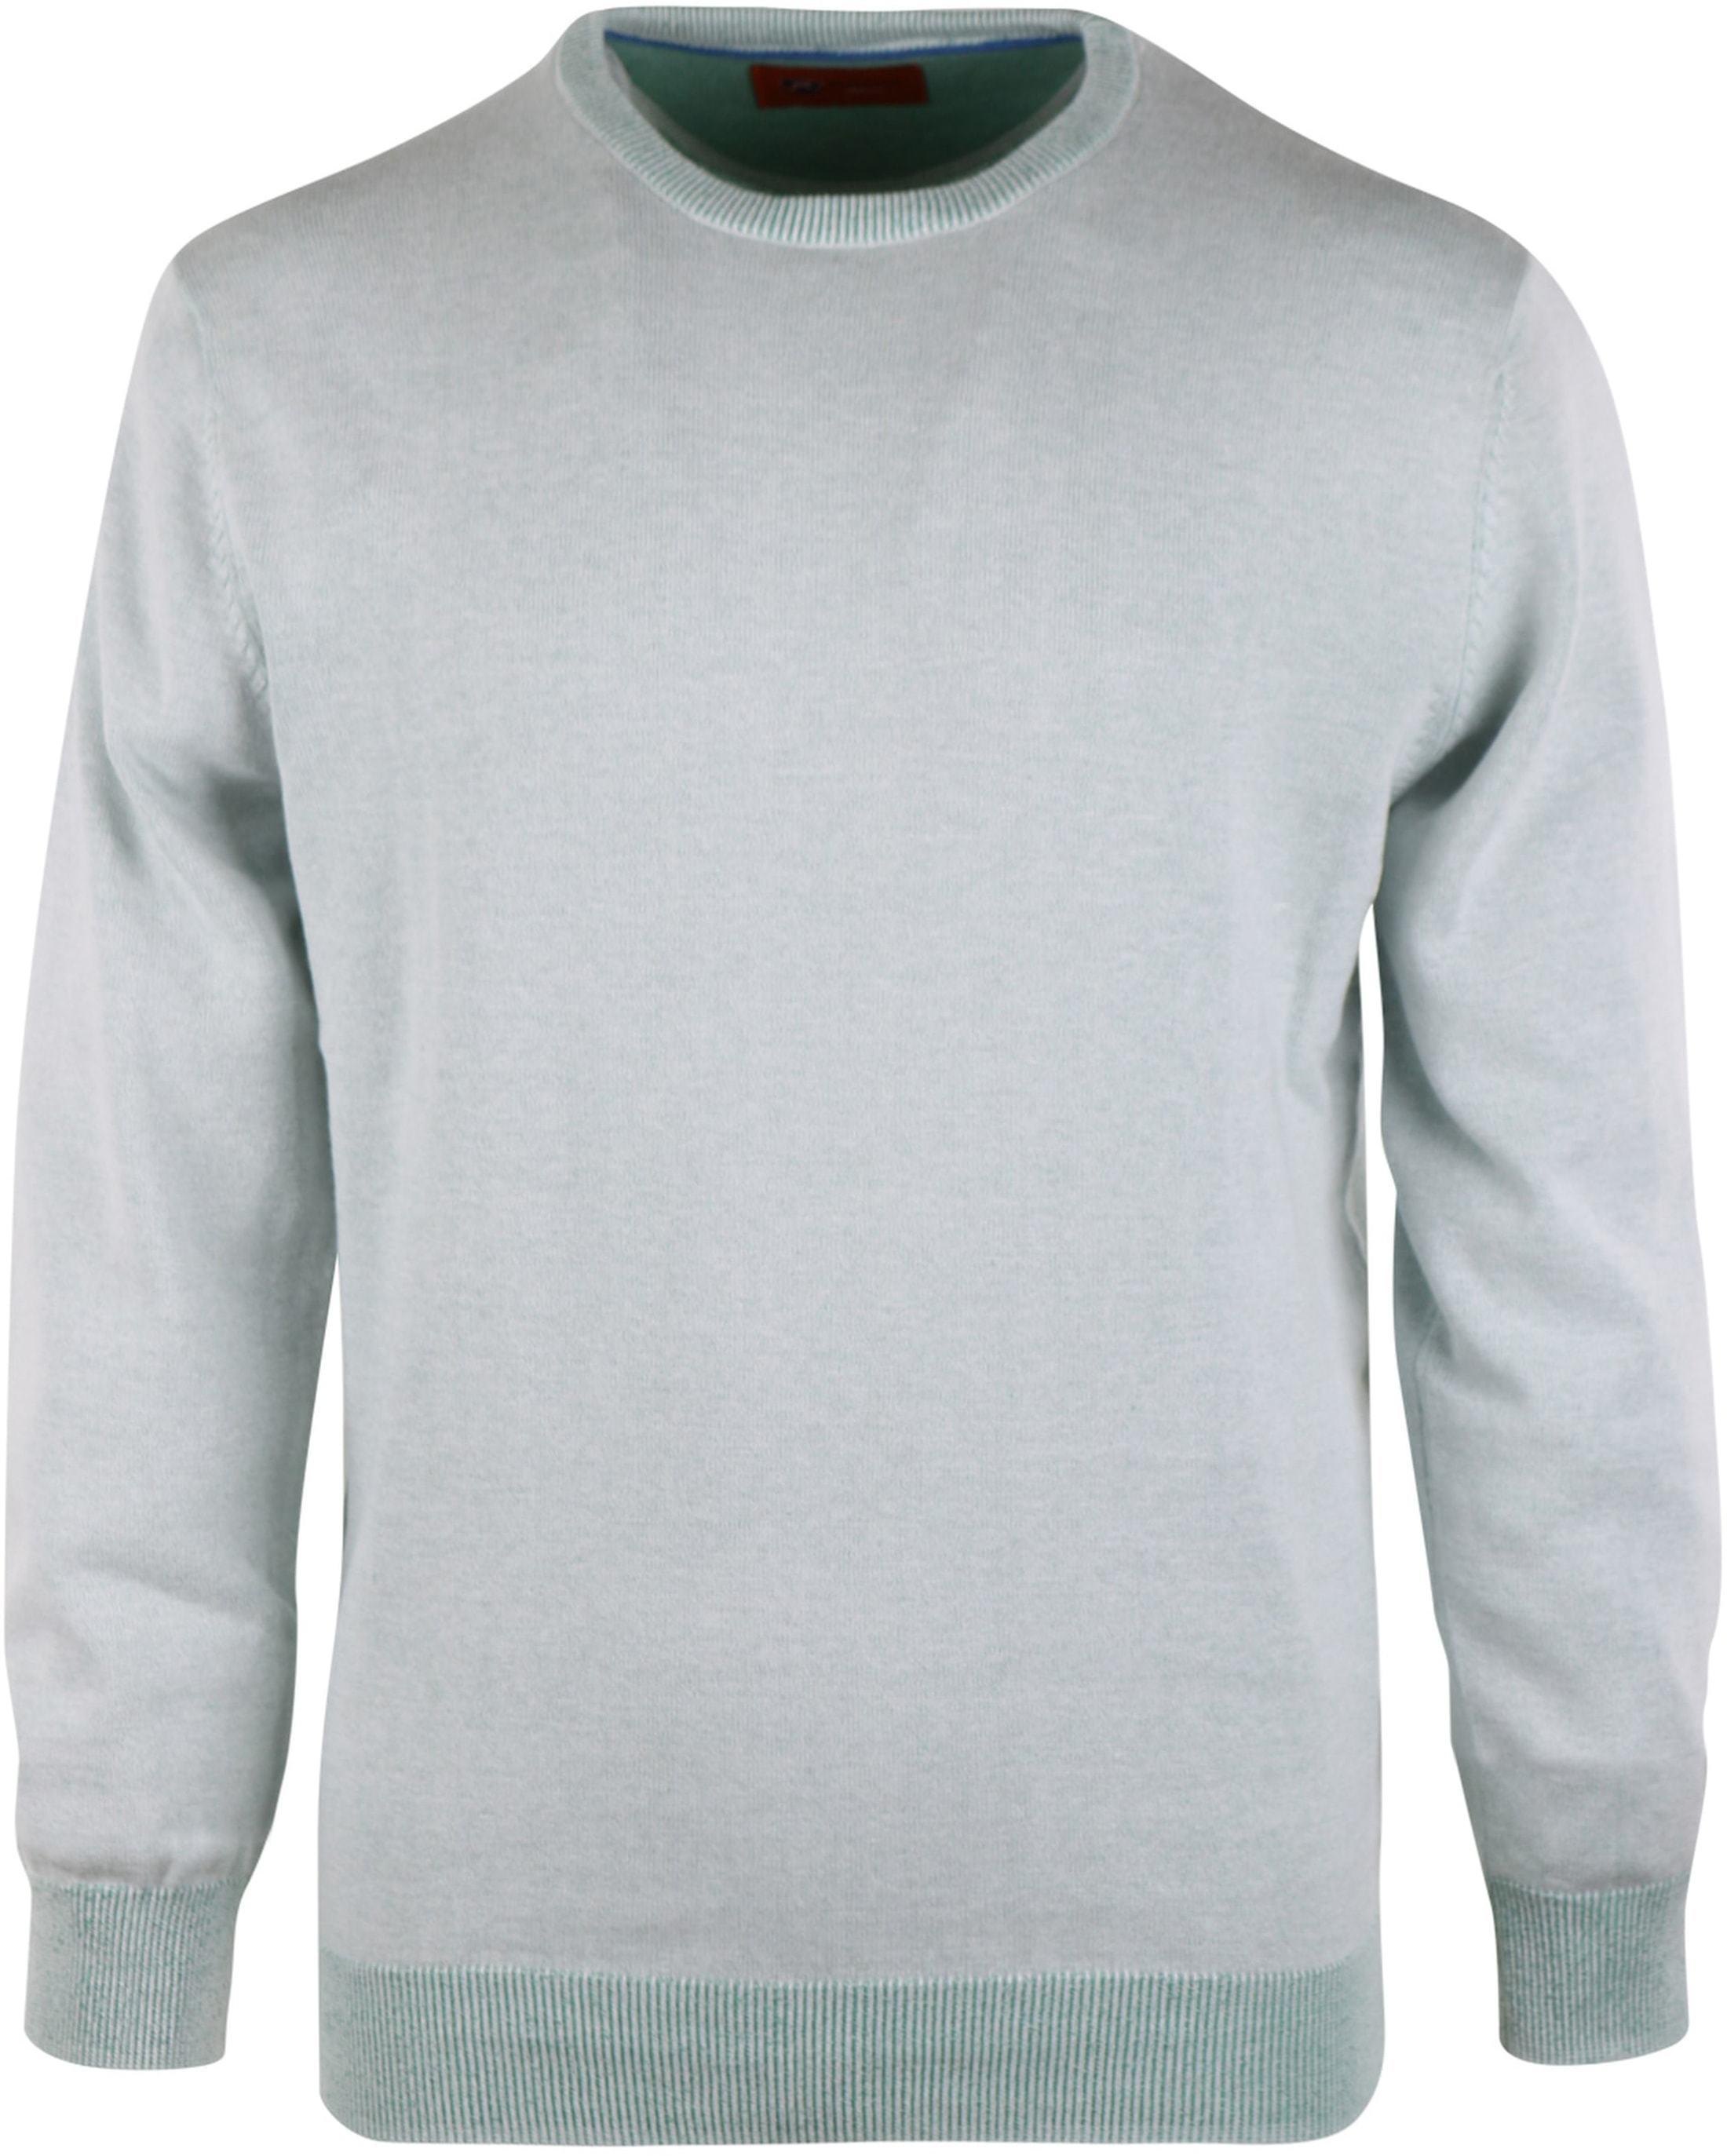 Pullover O-Hals Groen foto 0